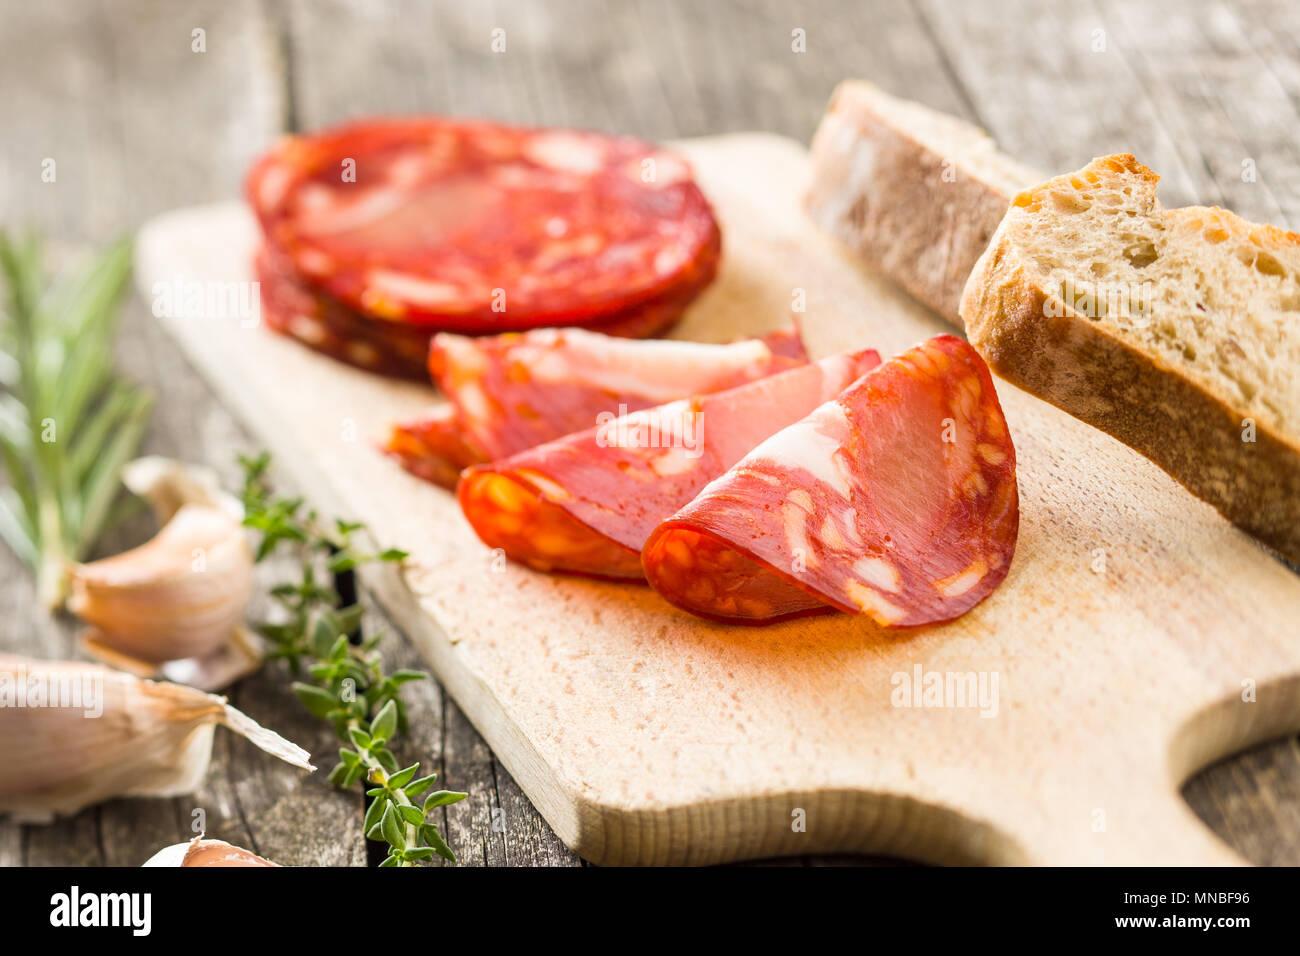 Sliced chorizo salami sausage on cutting board. - Stock Image